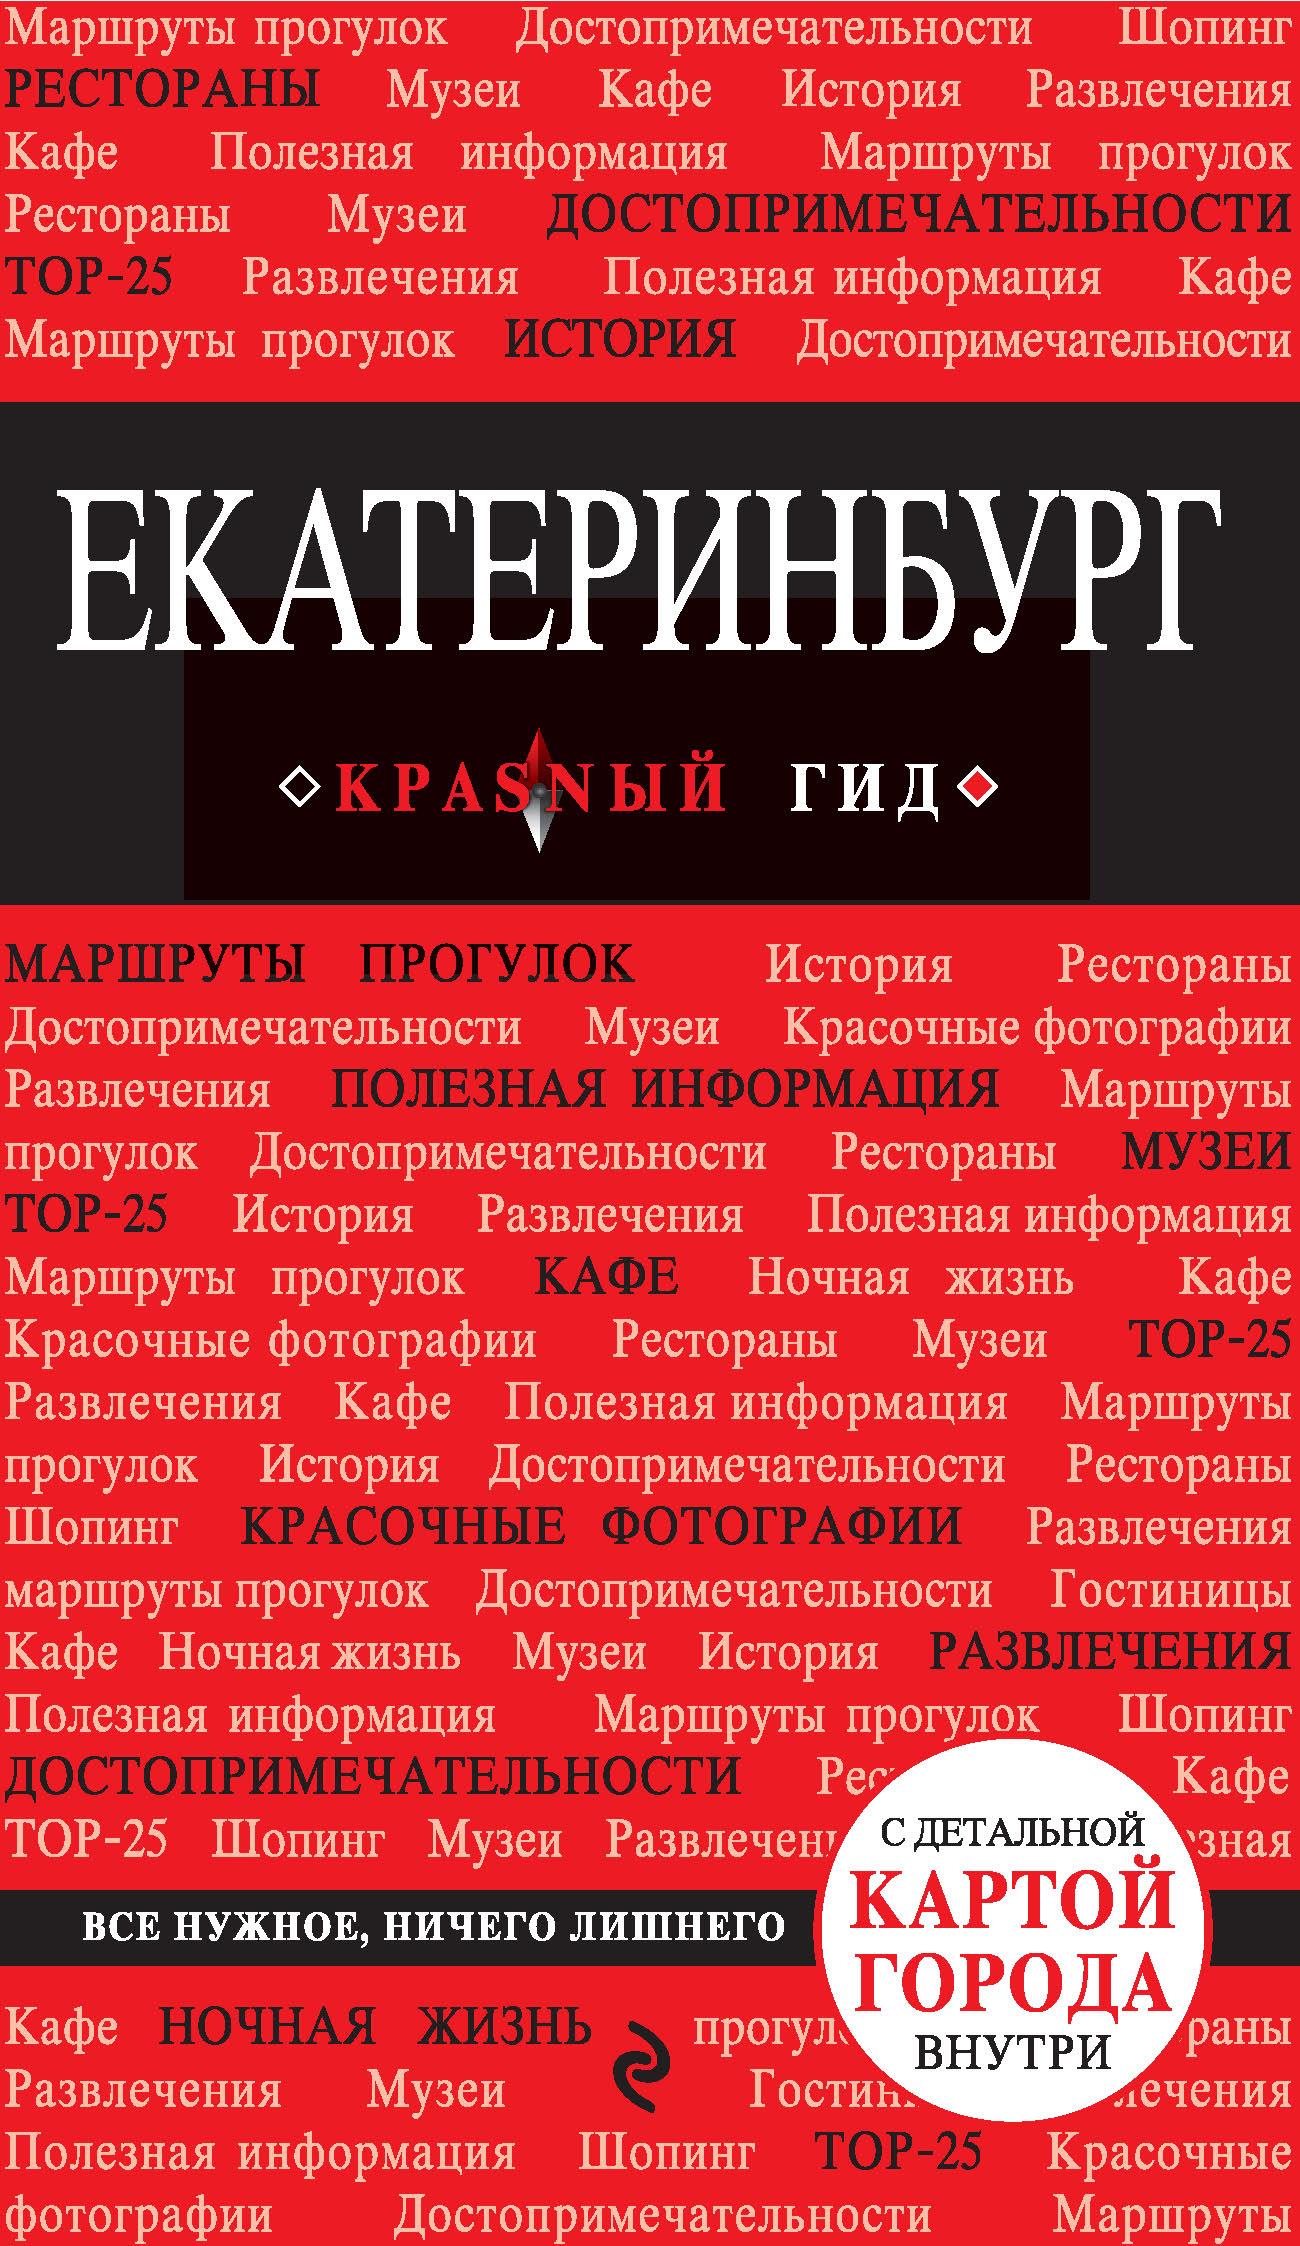 Дмитрий Кульков Екатеринбург дмитрий кульков екатеринбург isbn 978 5 699 86596 3